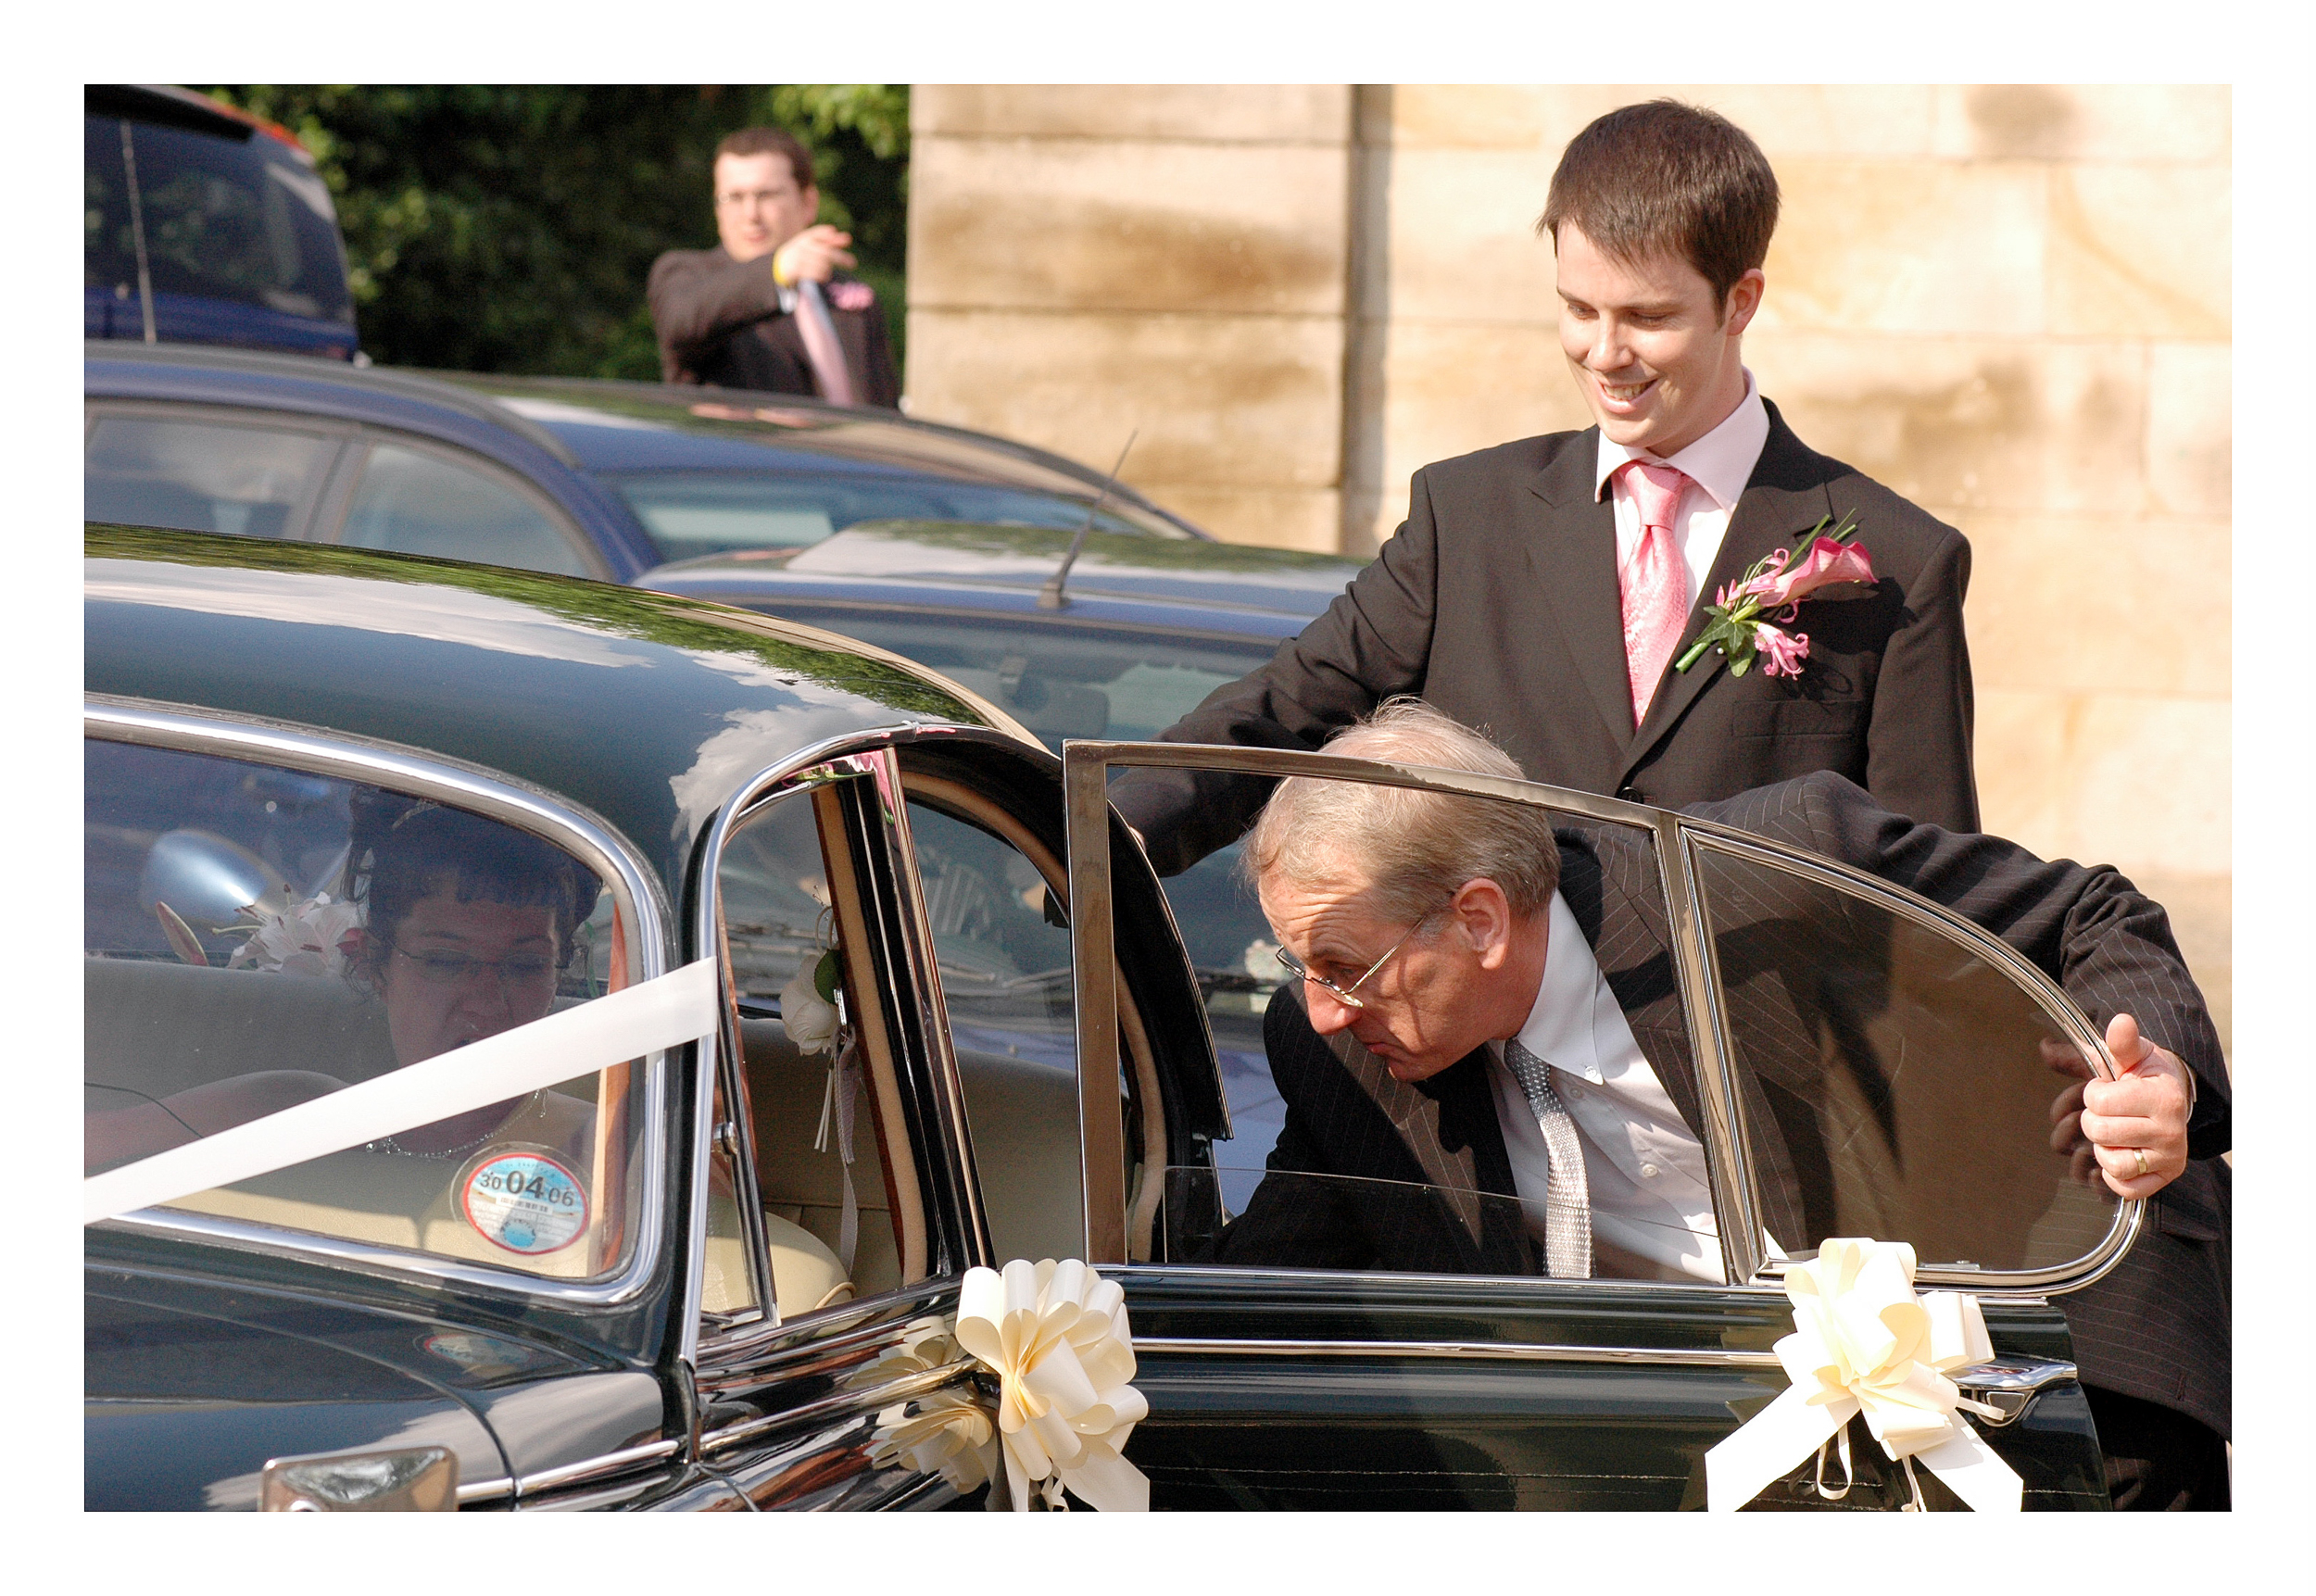 REPORTAGE-WEDDING-PHOTOGRAPHY-SET-UK-33.jpg